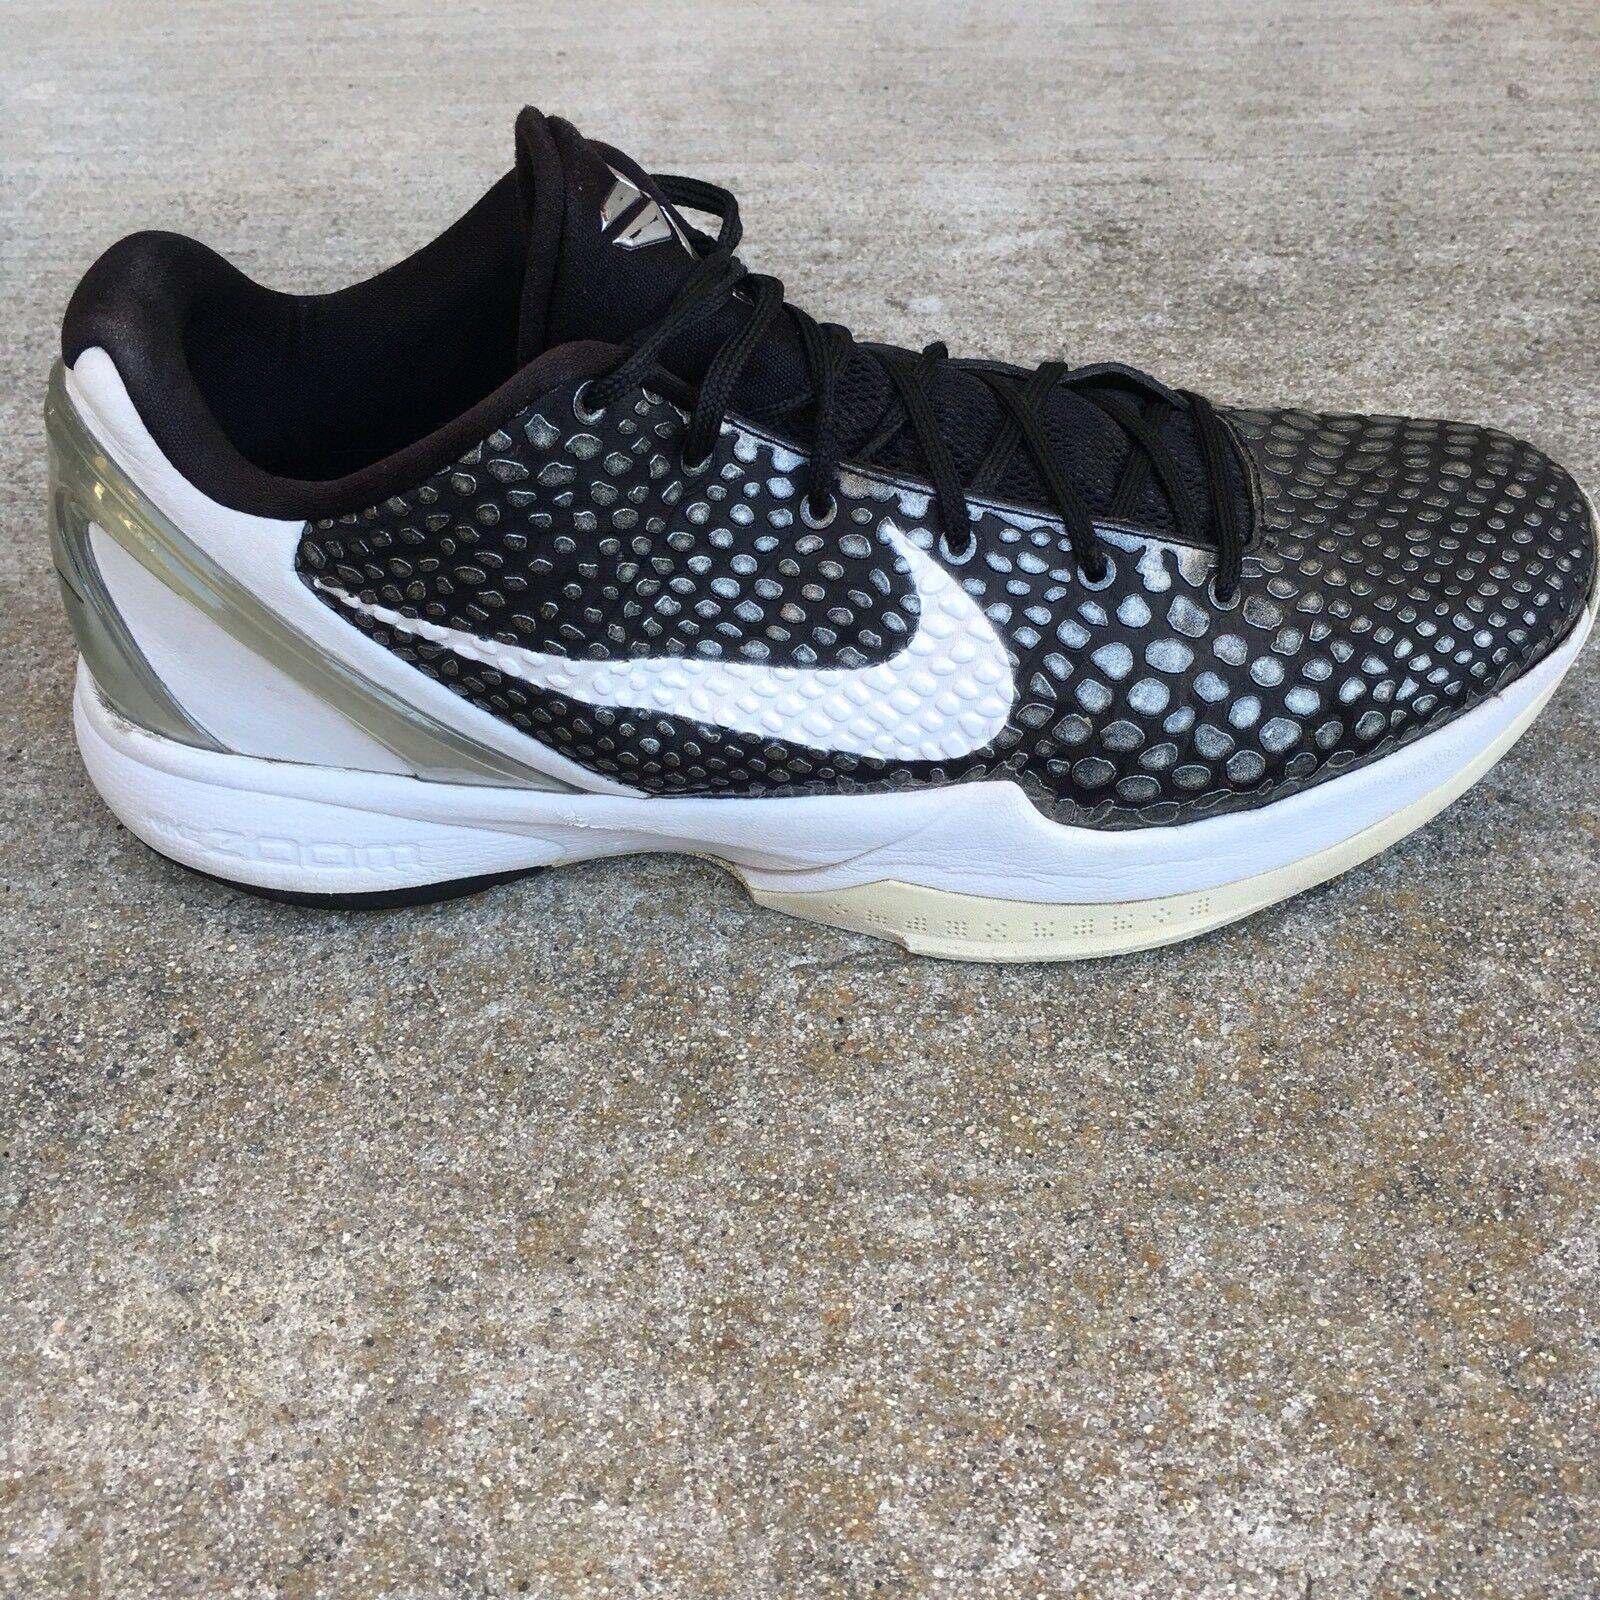 Nike zoom kobe männer sz 13 graue grau - weißen metallischen graue 13 schlange haut schuh 454142-011 01e5e7